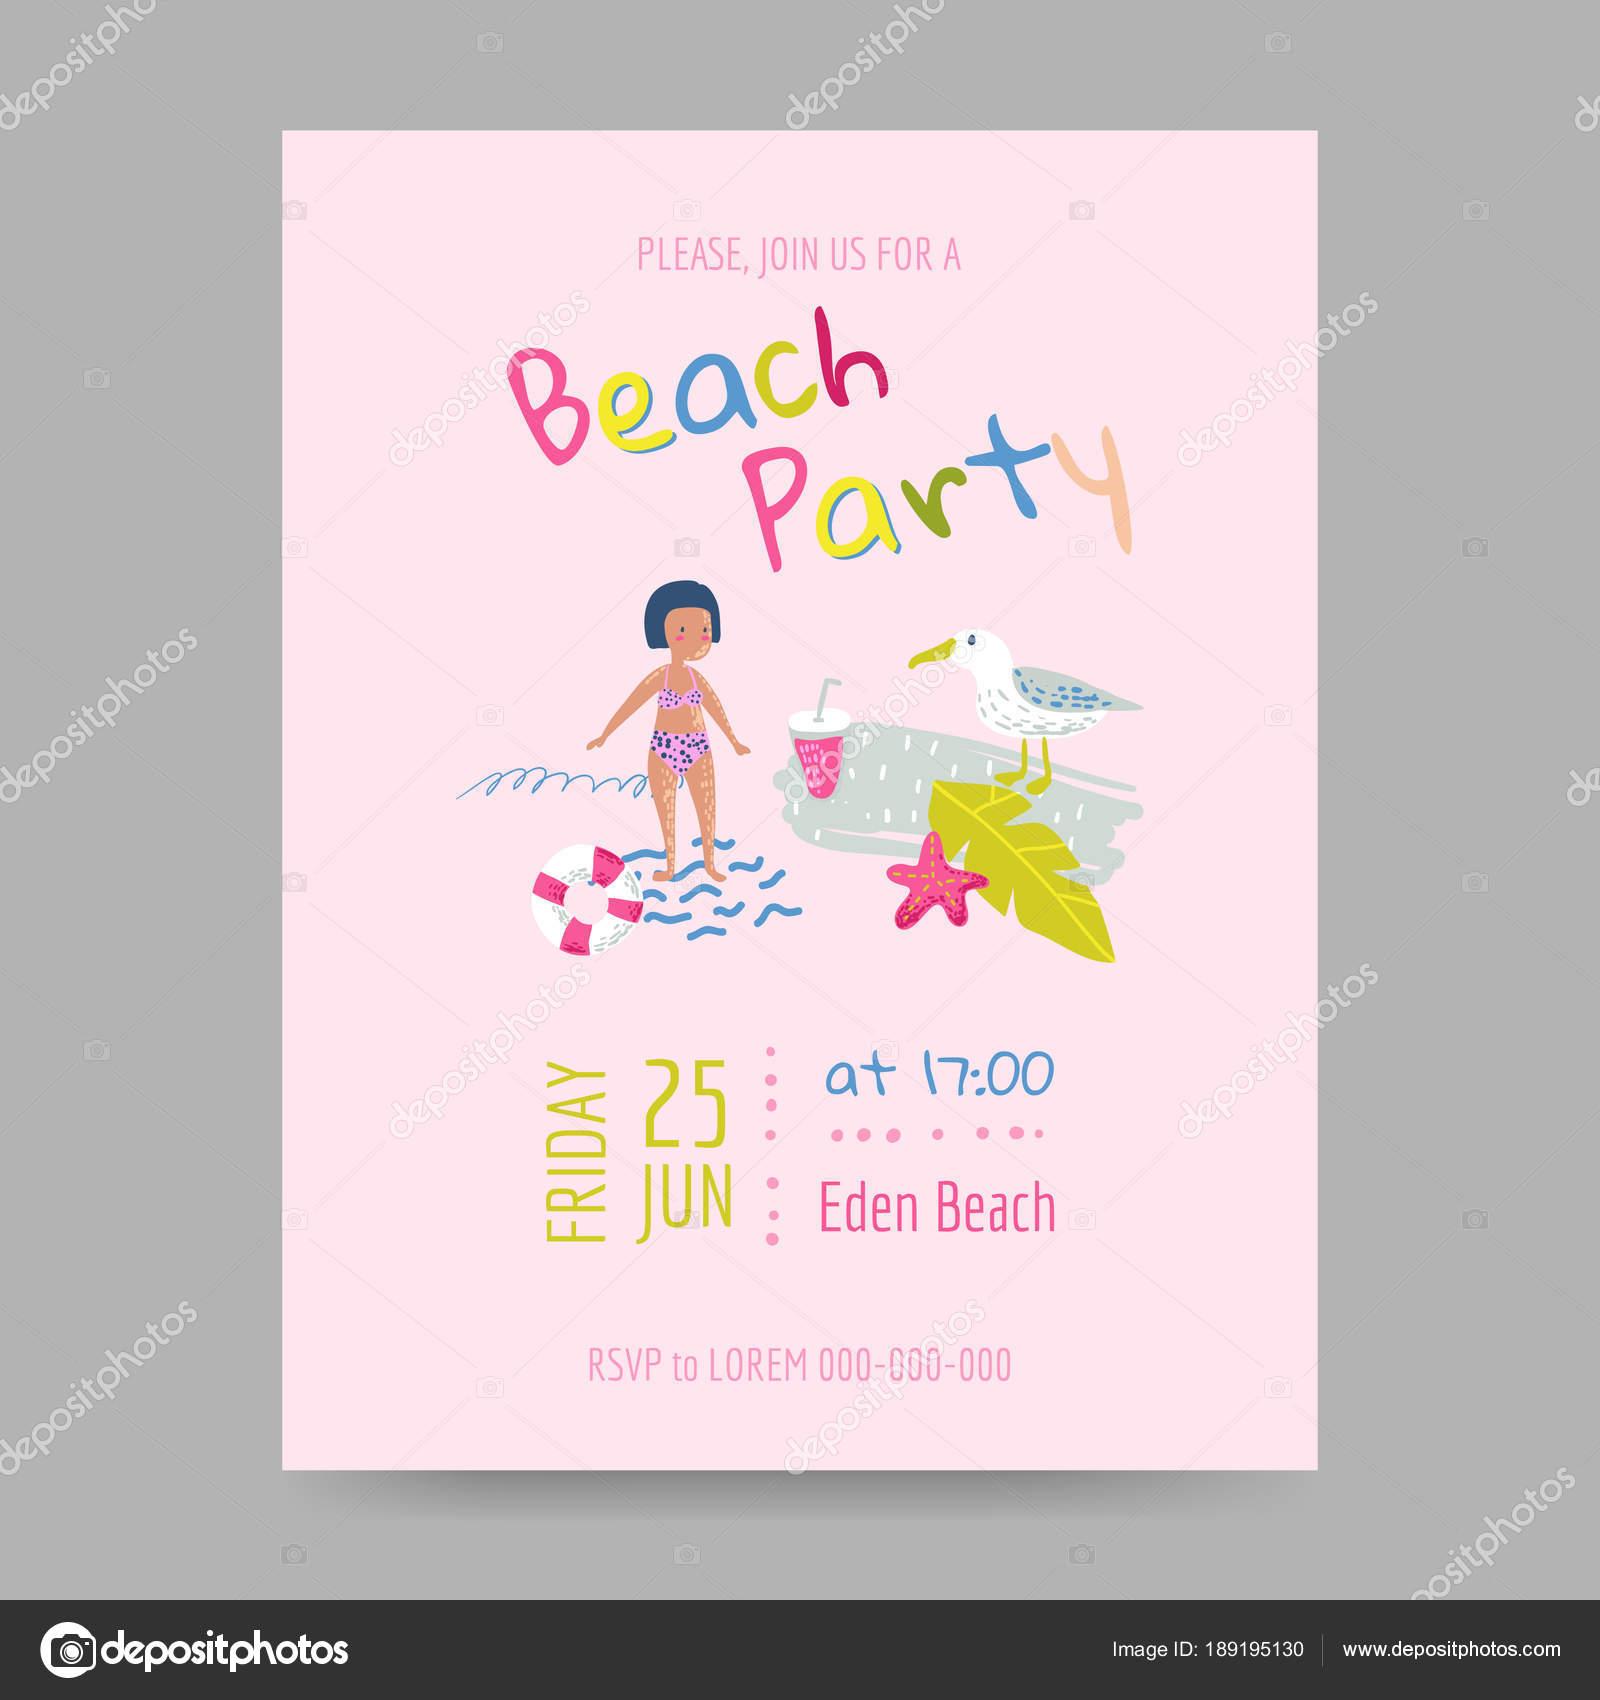 Vector Invitacion A Fiesta Infantil Tarjeta De Playa De Verano